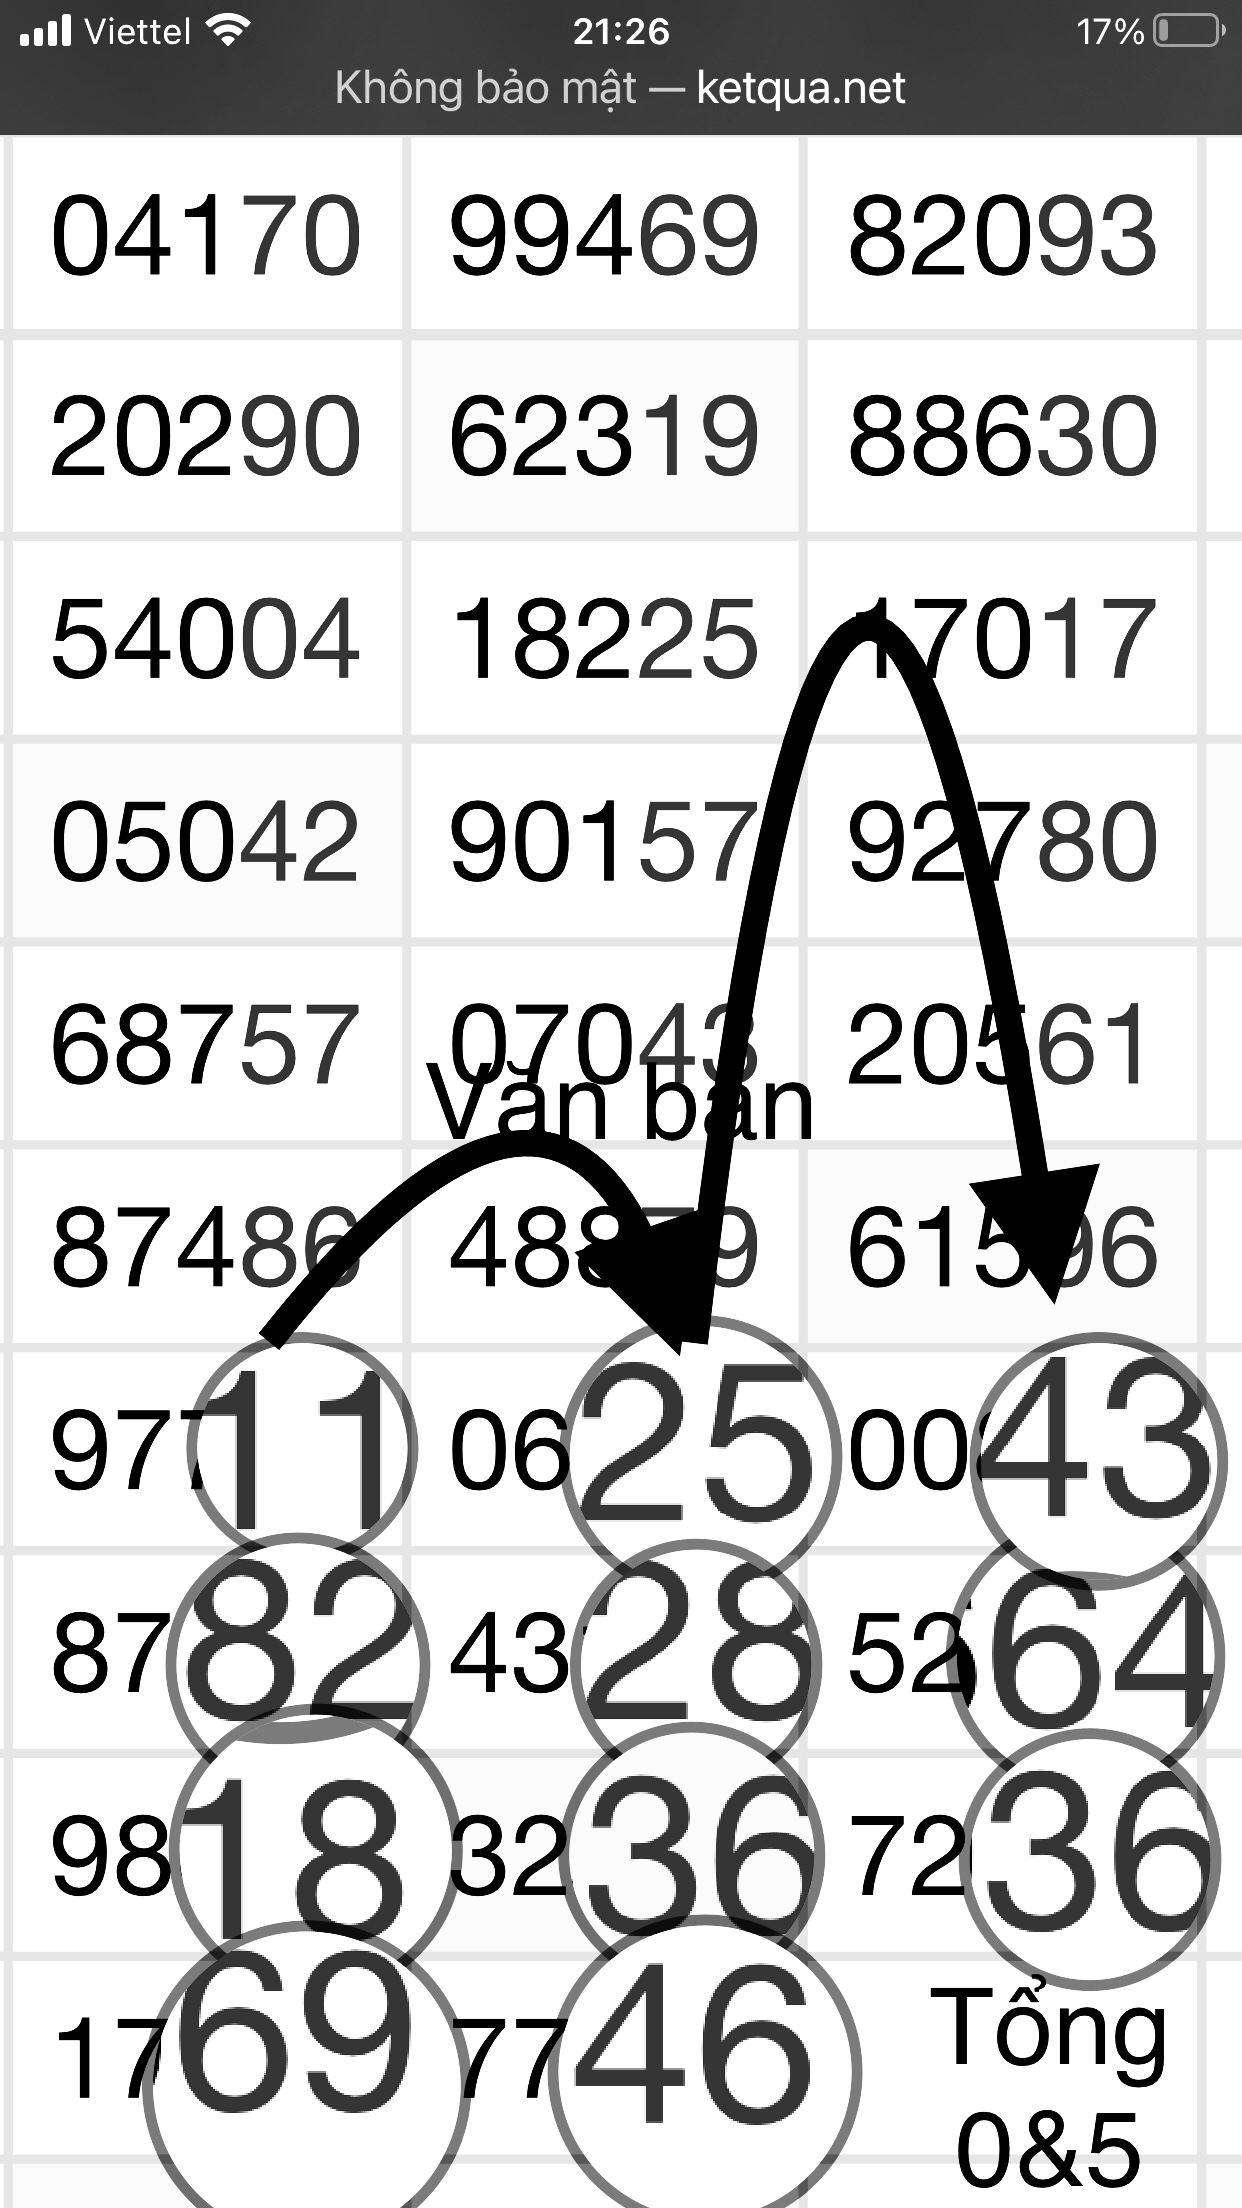 AFB1136A-3FE2-44D1-8CB1-0E1F7A703608.jpeg